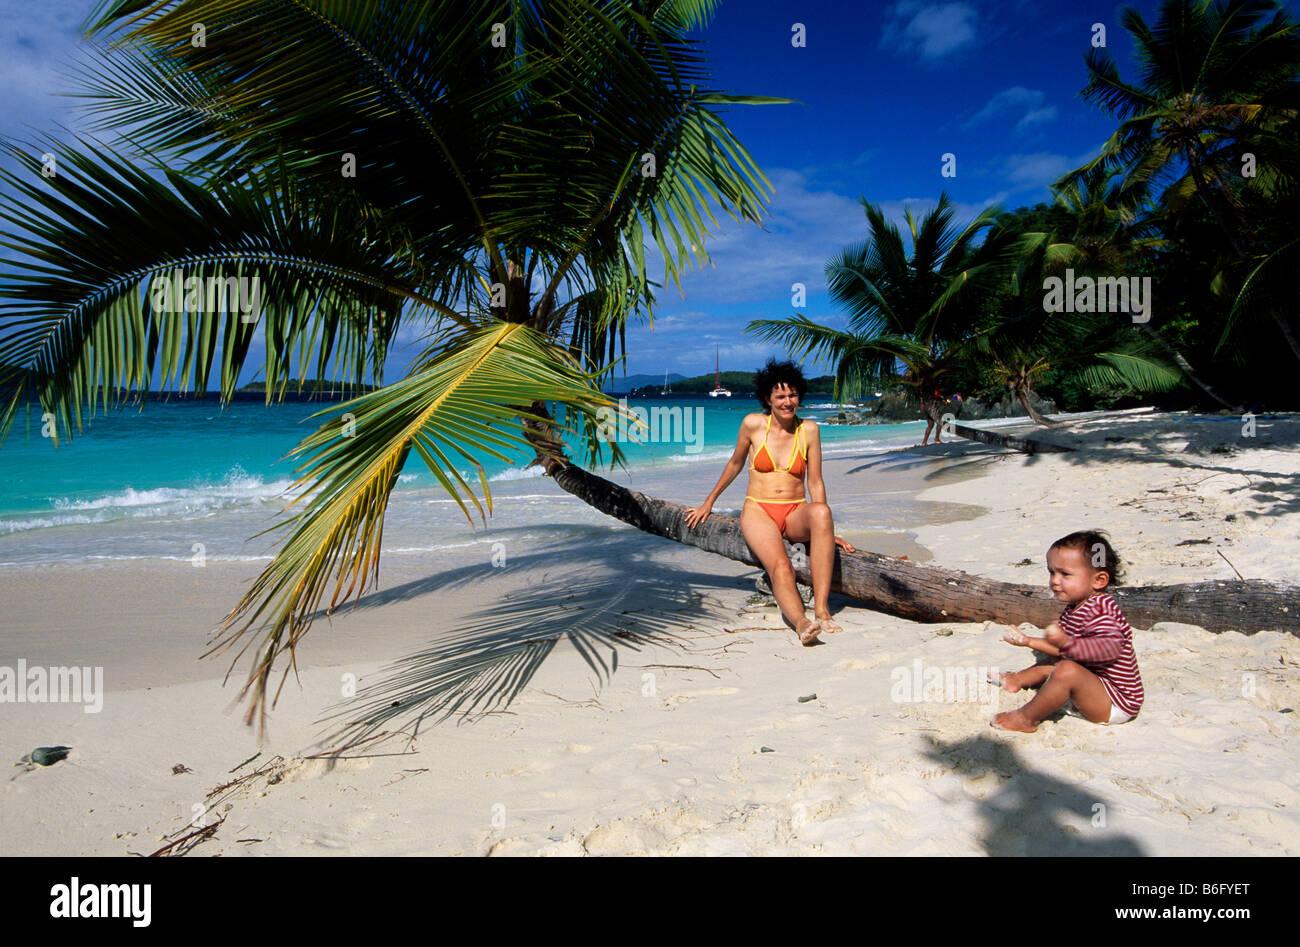 Virgin Islands Windjammer Cruises and Caribbean Sailing